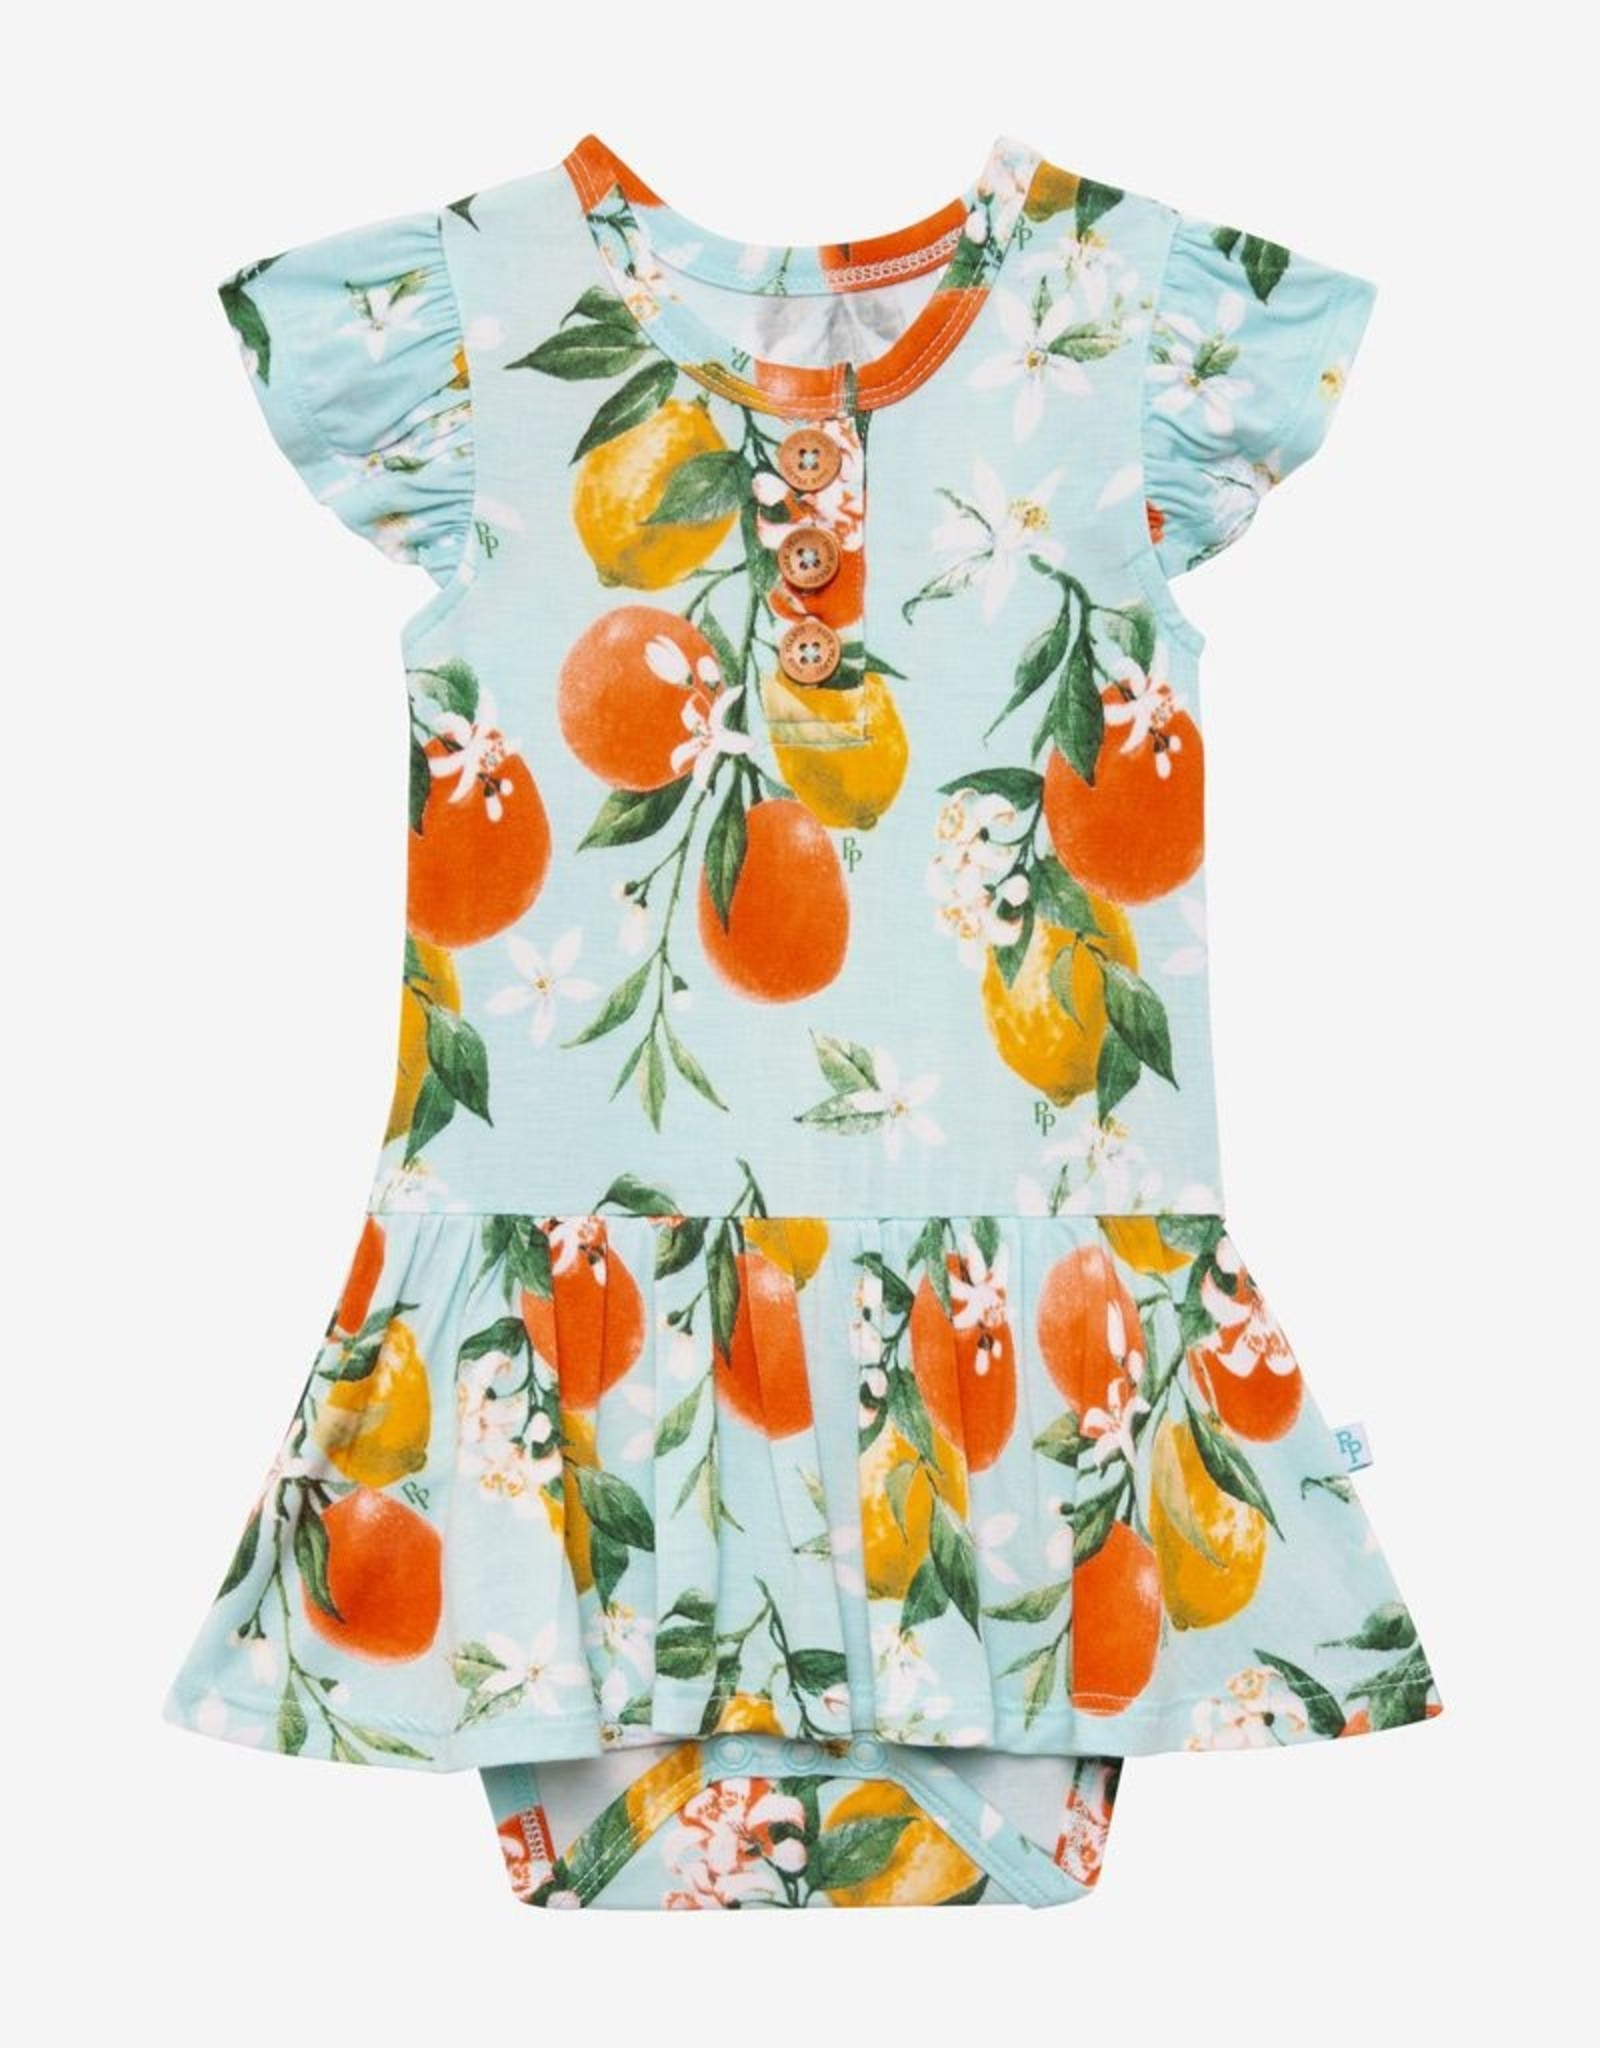 Posh Peanut Mirabella capsleeve Twirl Skirt Bodysuit